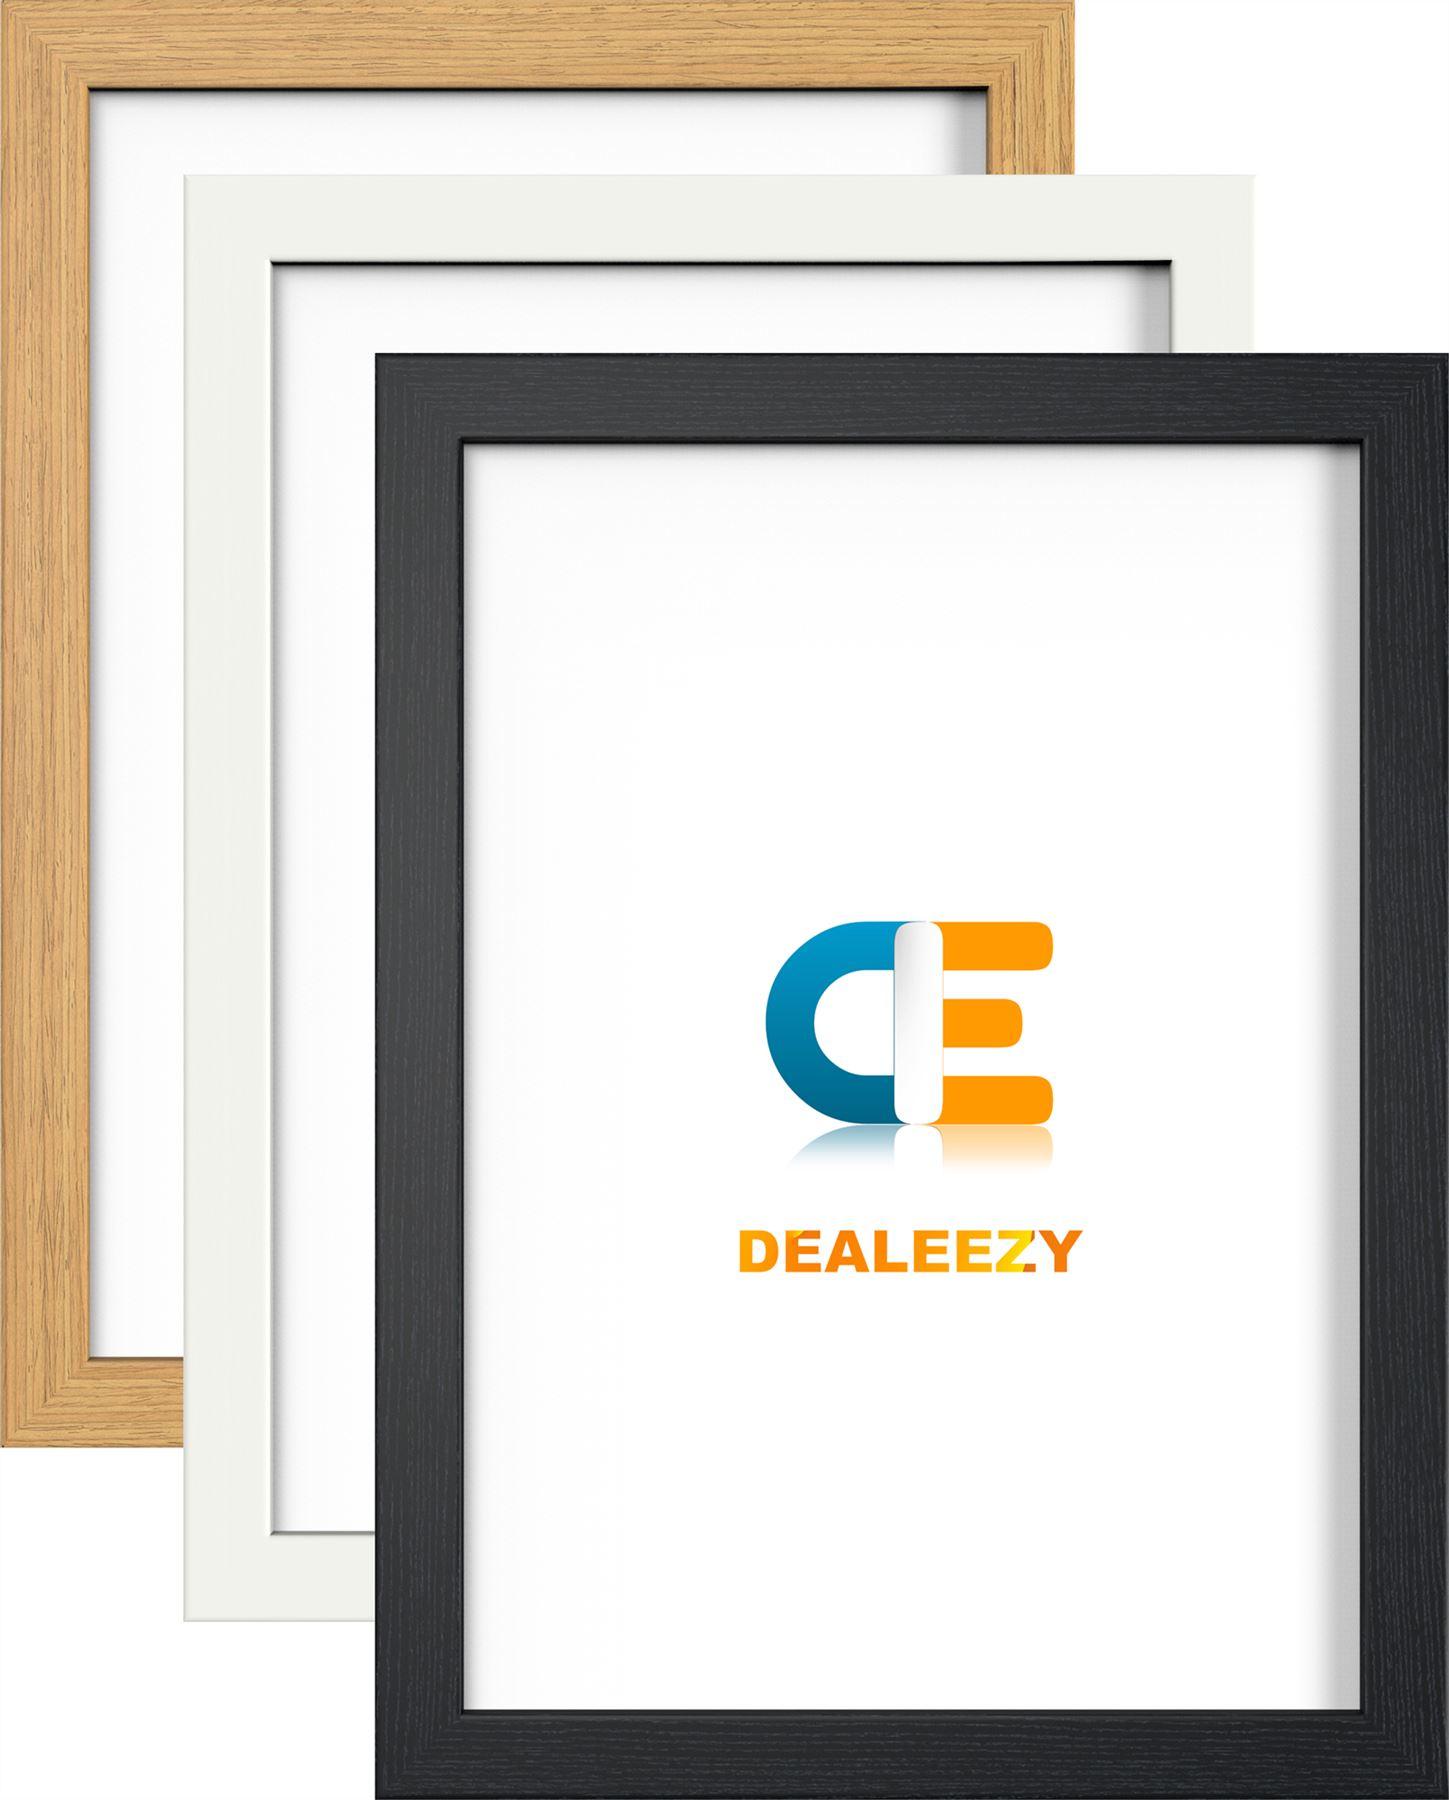 picture photo frame large maxi poster frames black white oak colour wood effect